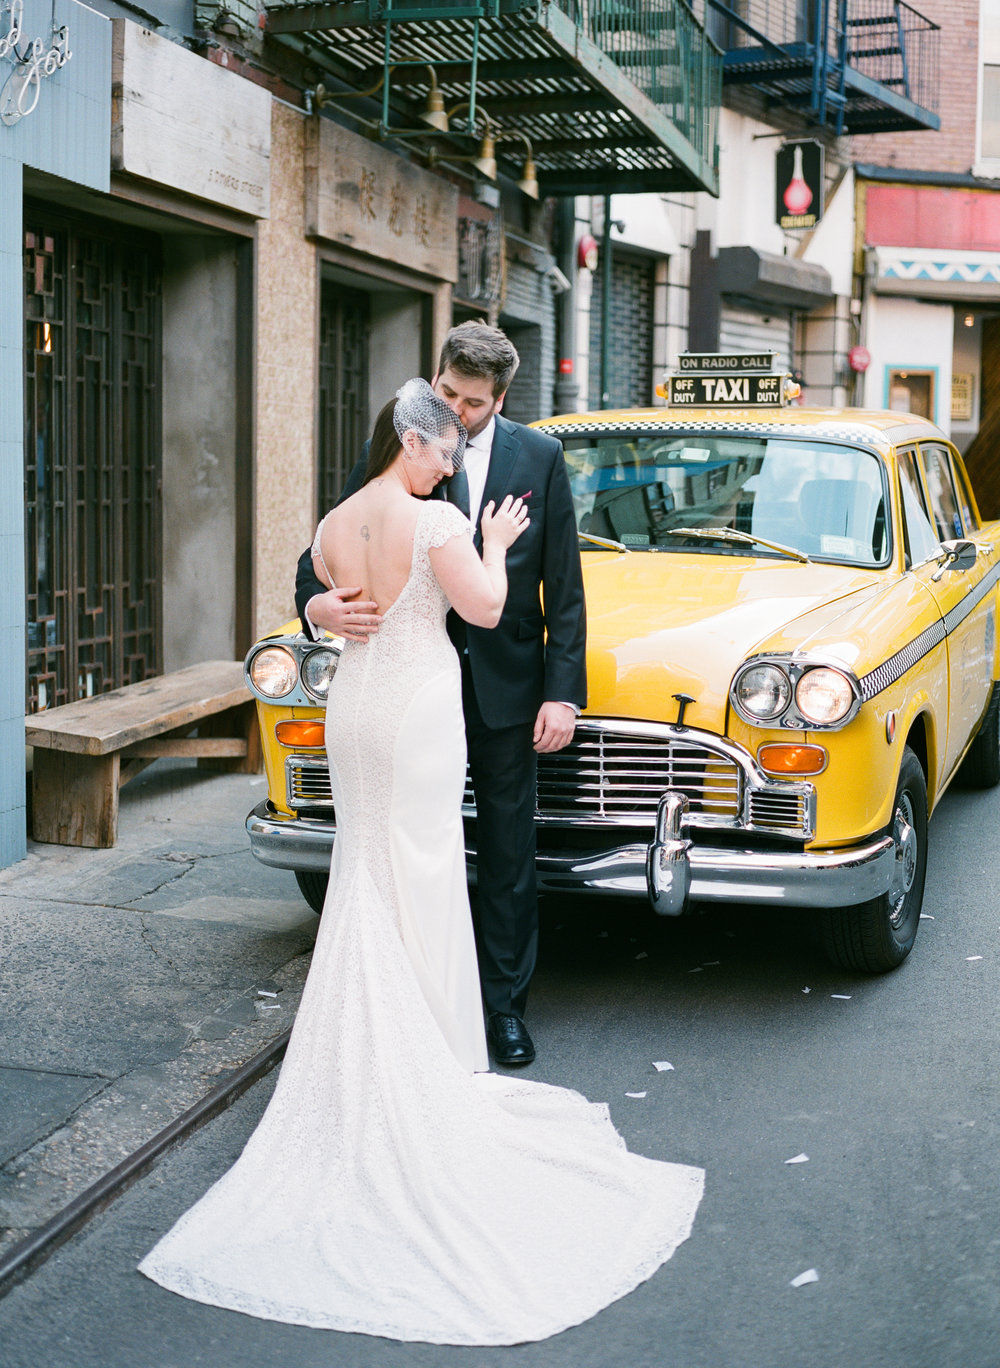 Claire+James_MediumFormat_Wedding_PRINT-45.jpg